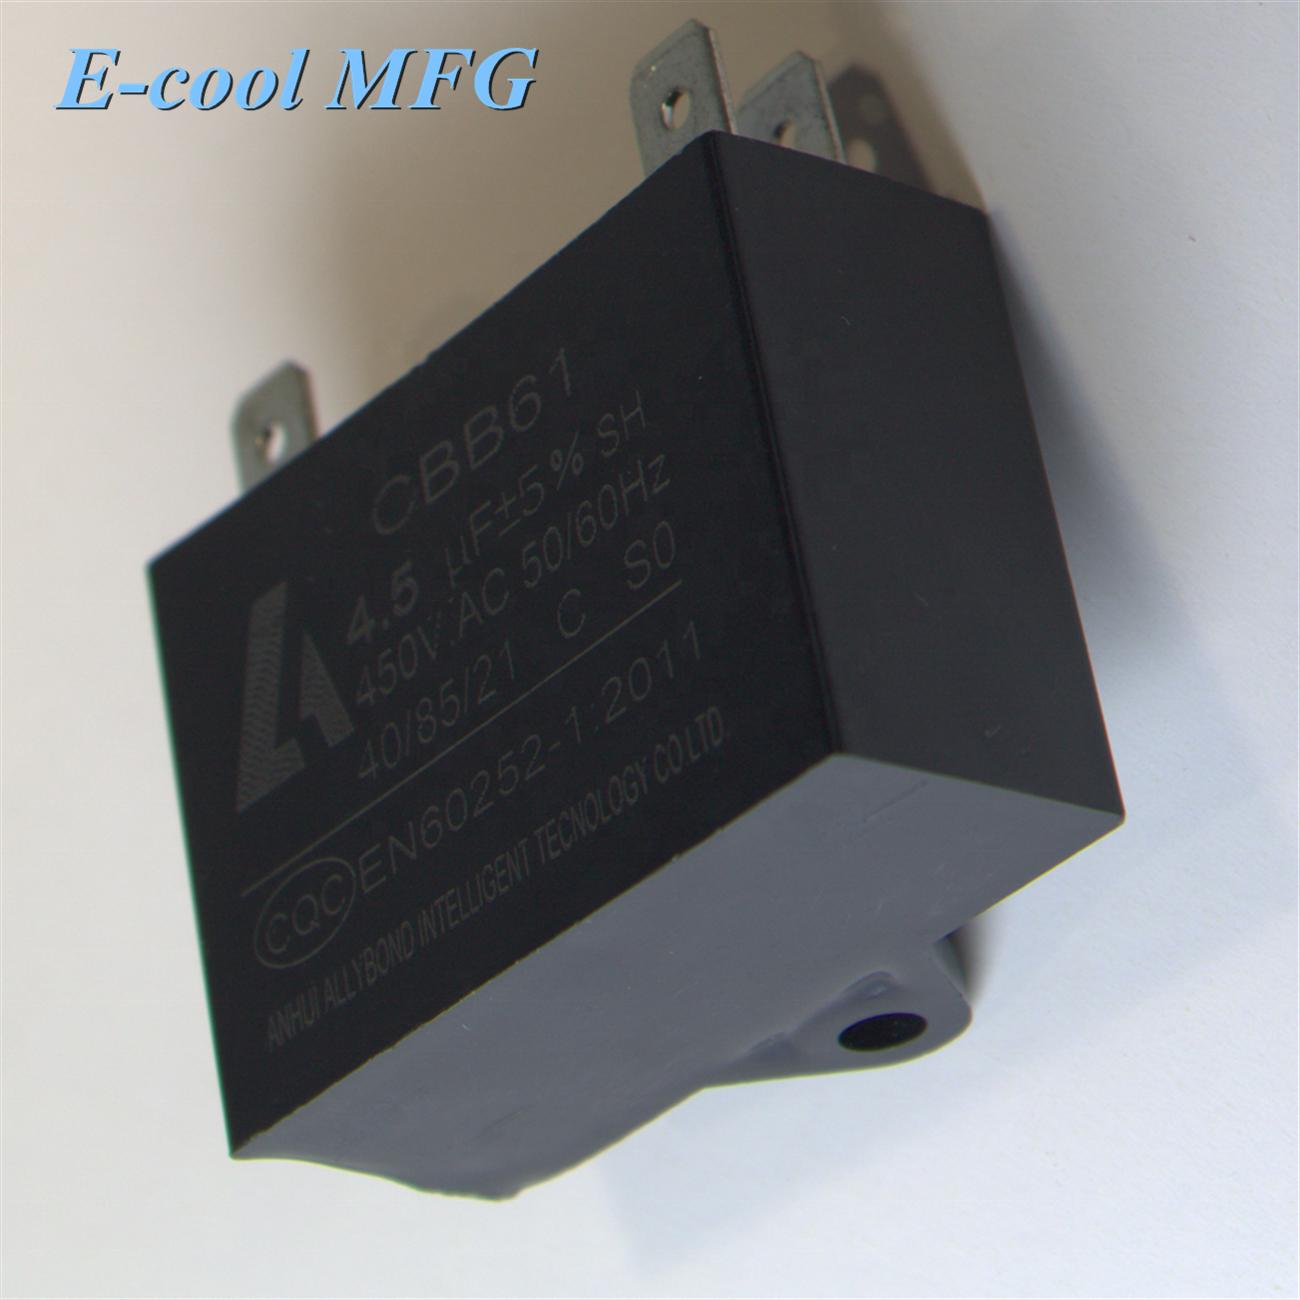 Cbb61 1.5uf 450 vac capacitor motor start